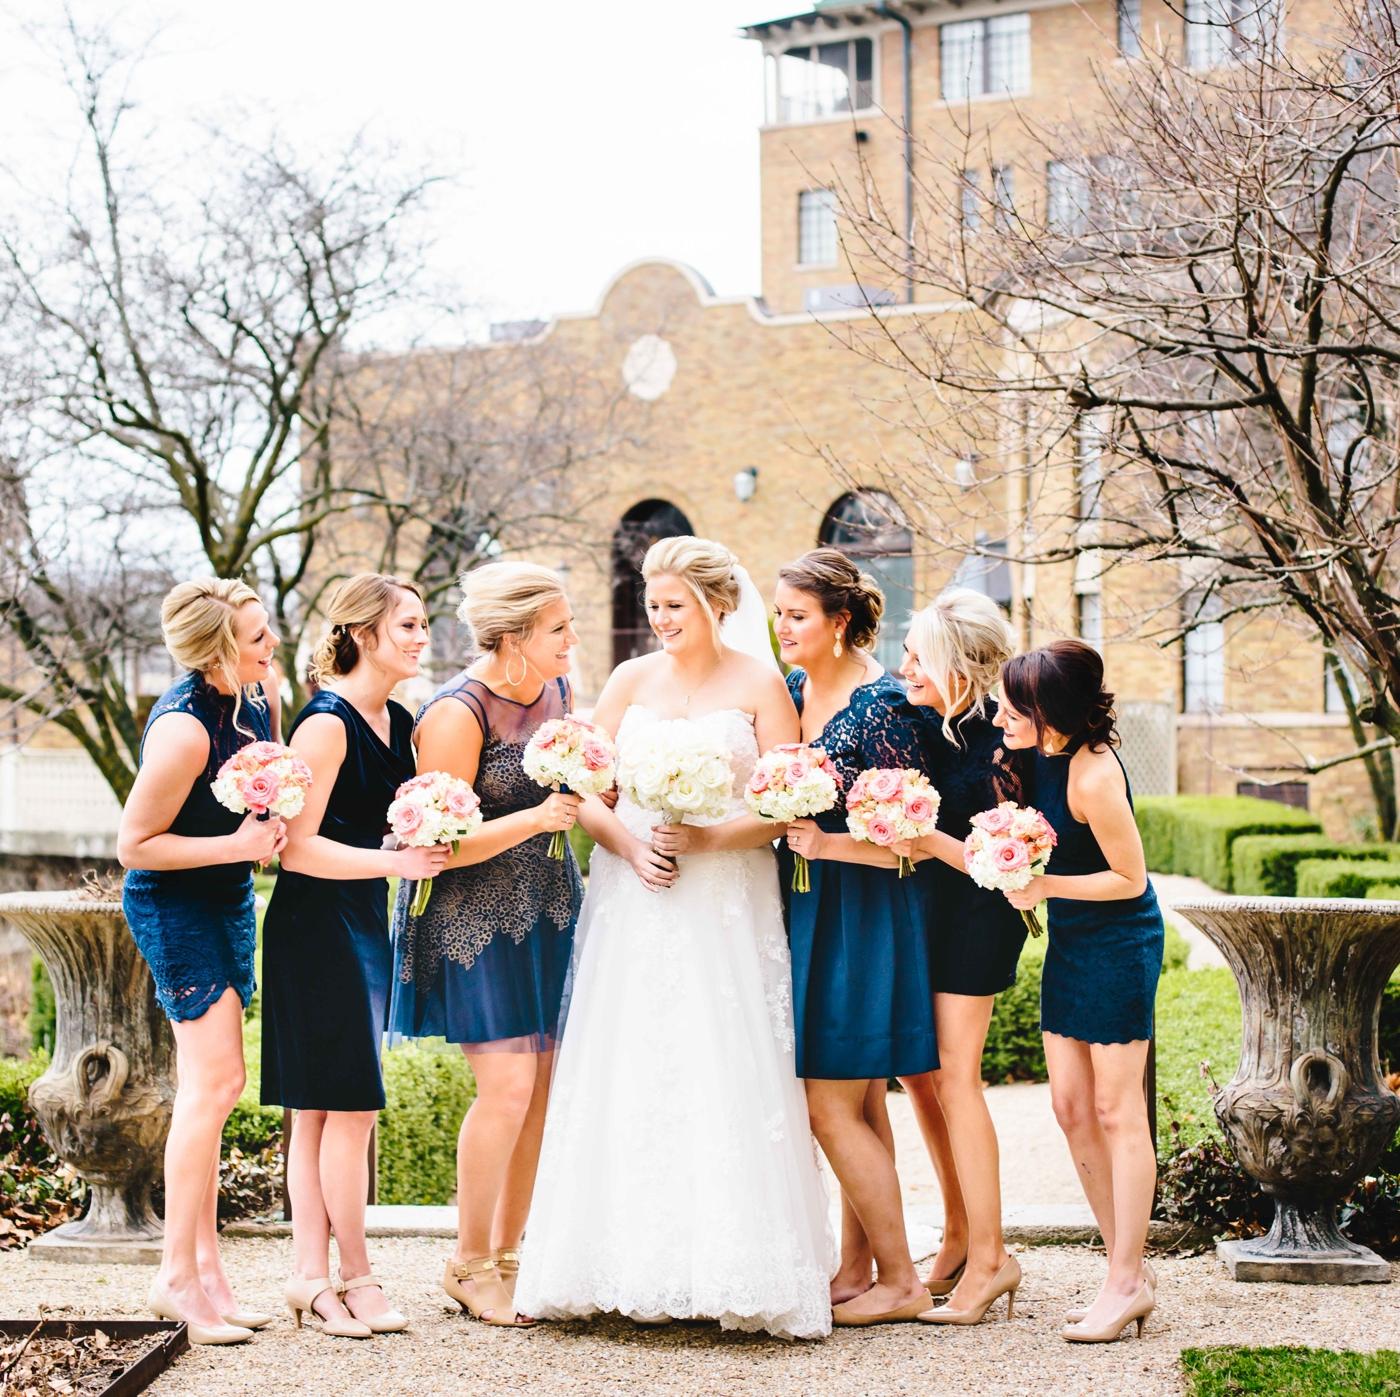 chicago-fine-art-wedding-photography-cassady10